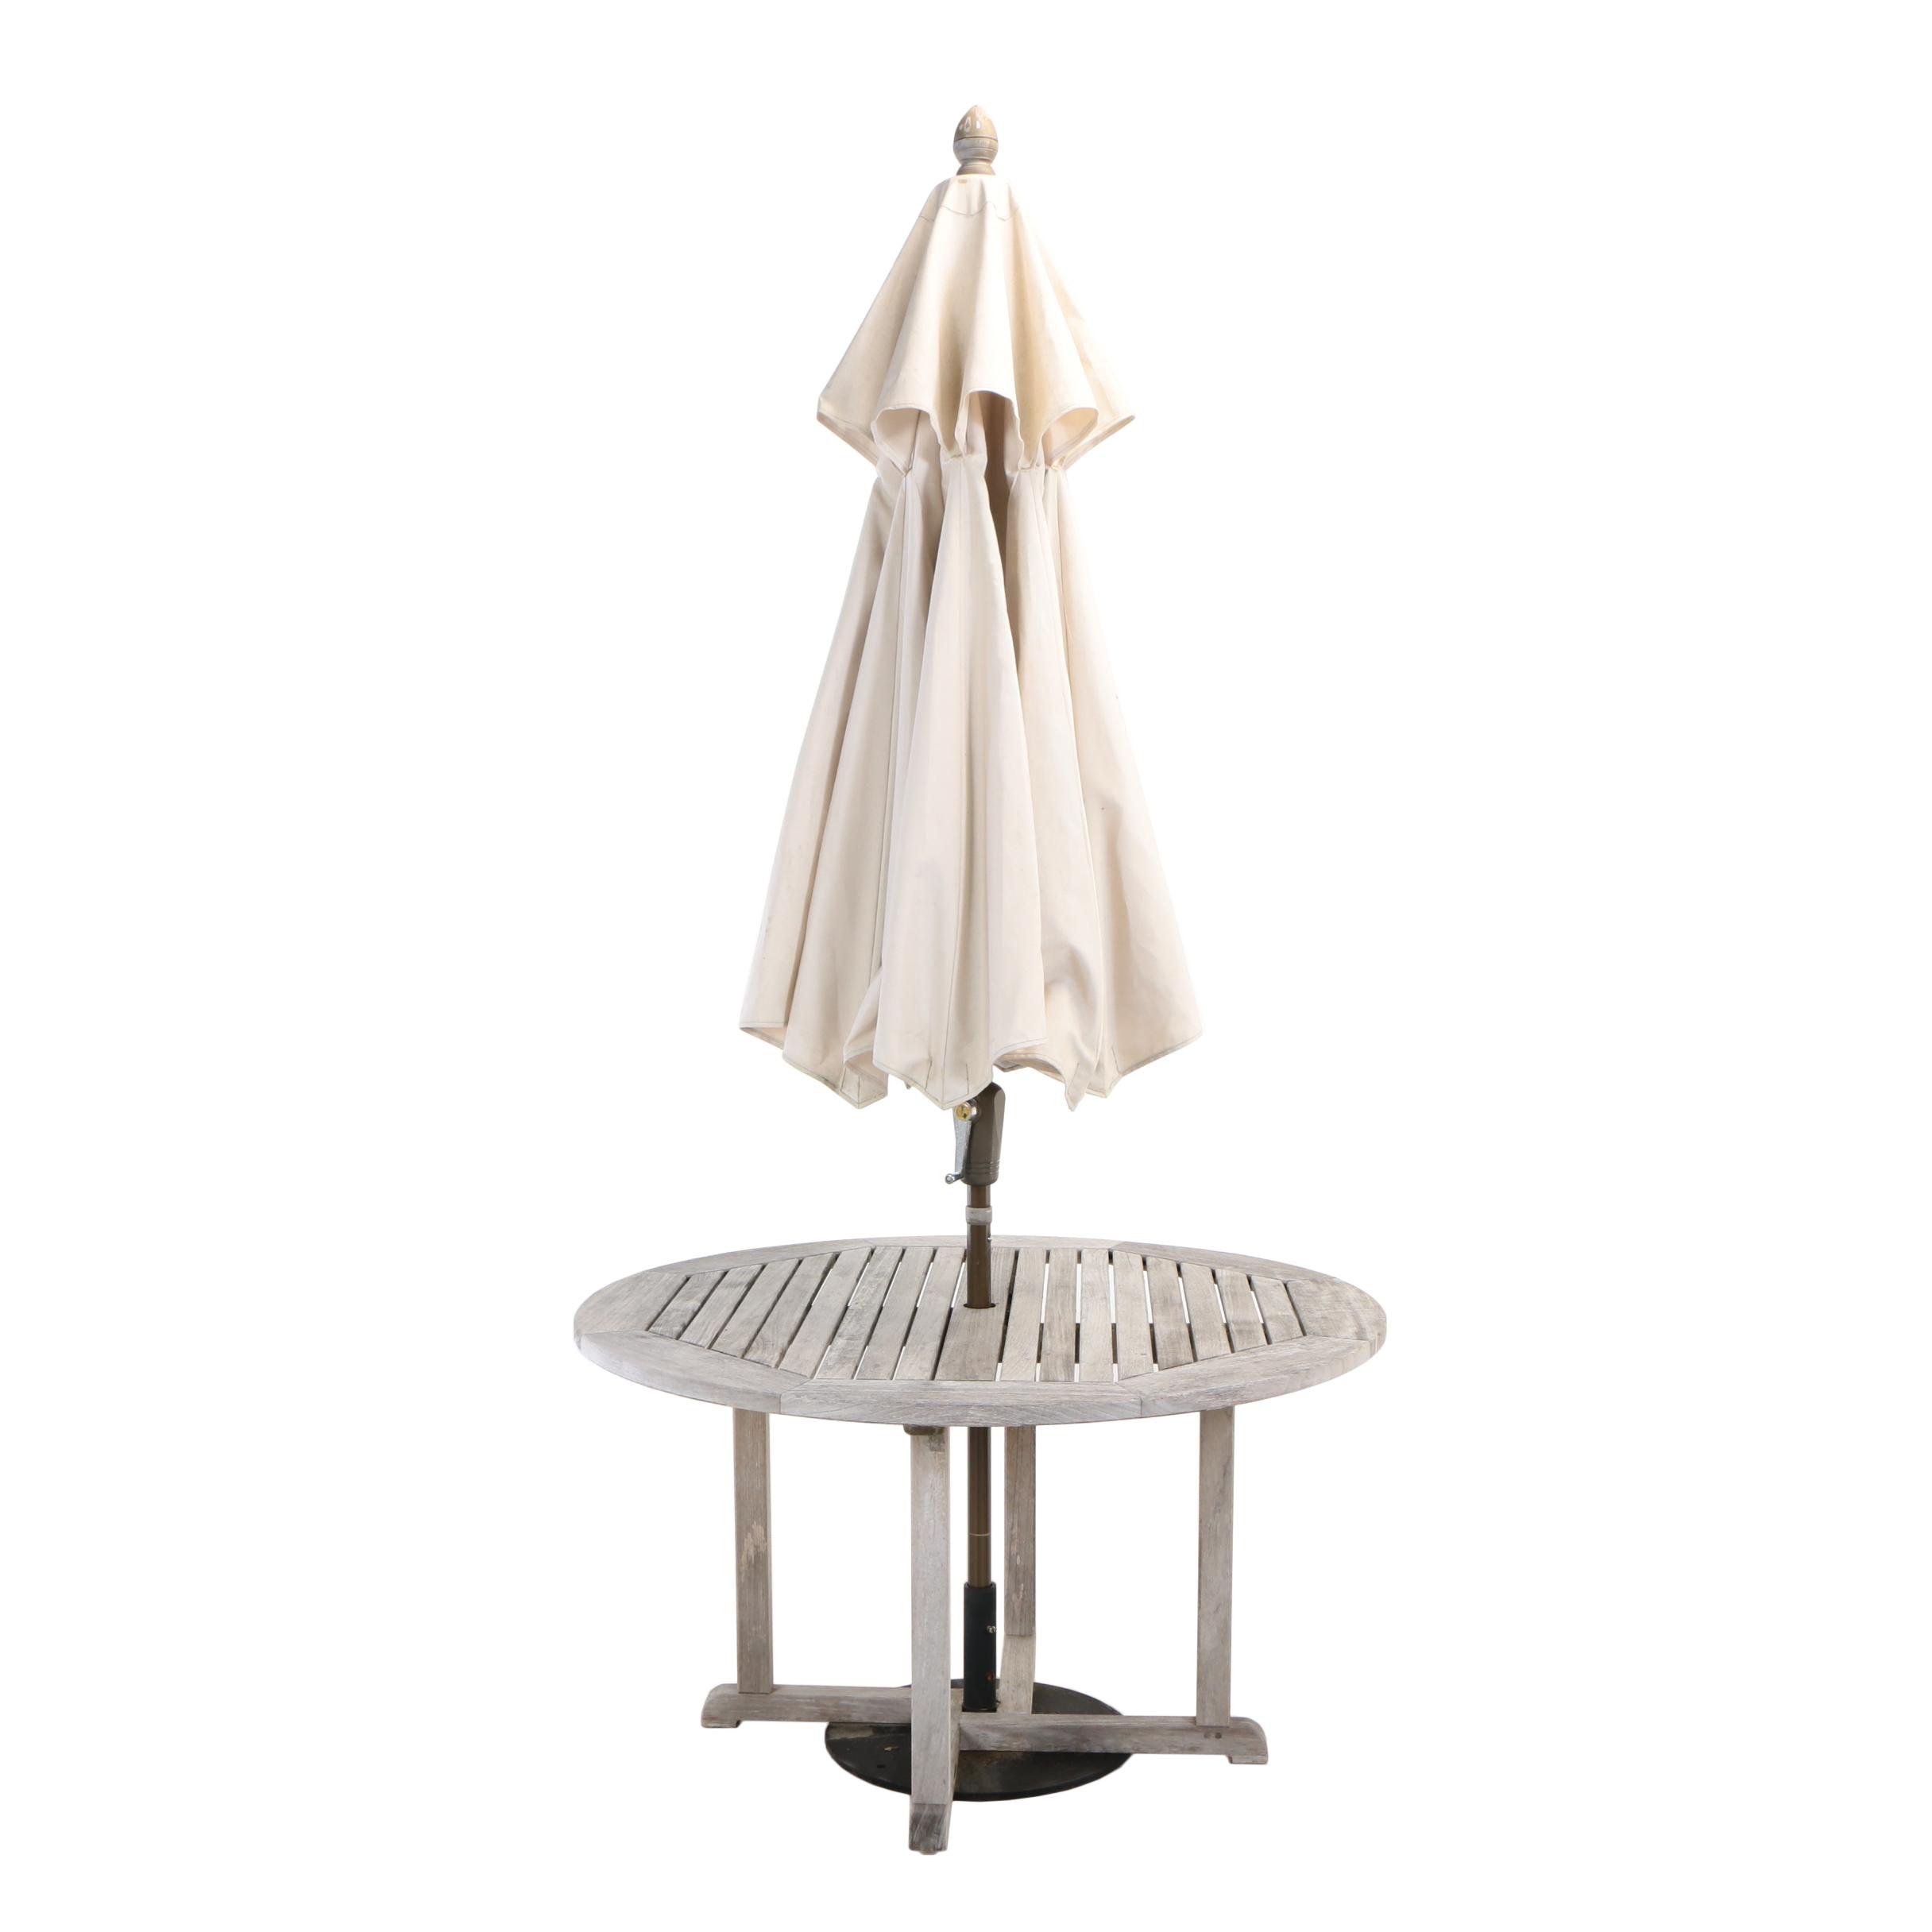 Kingsley-Bate Ltd., Teak Patio Dining Table with Fiberbuilt Umbrella